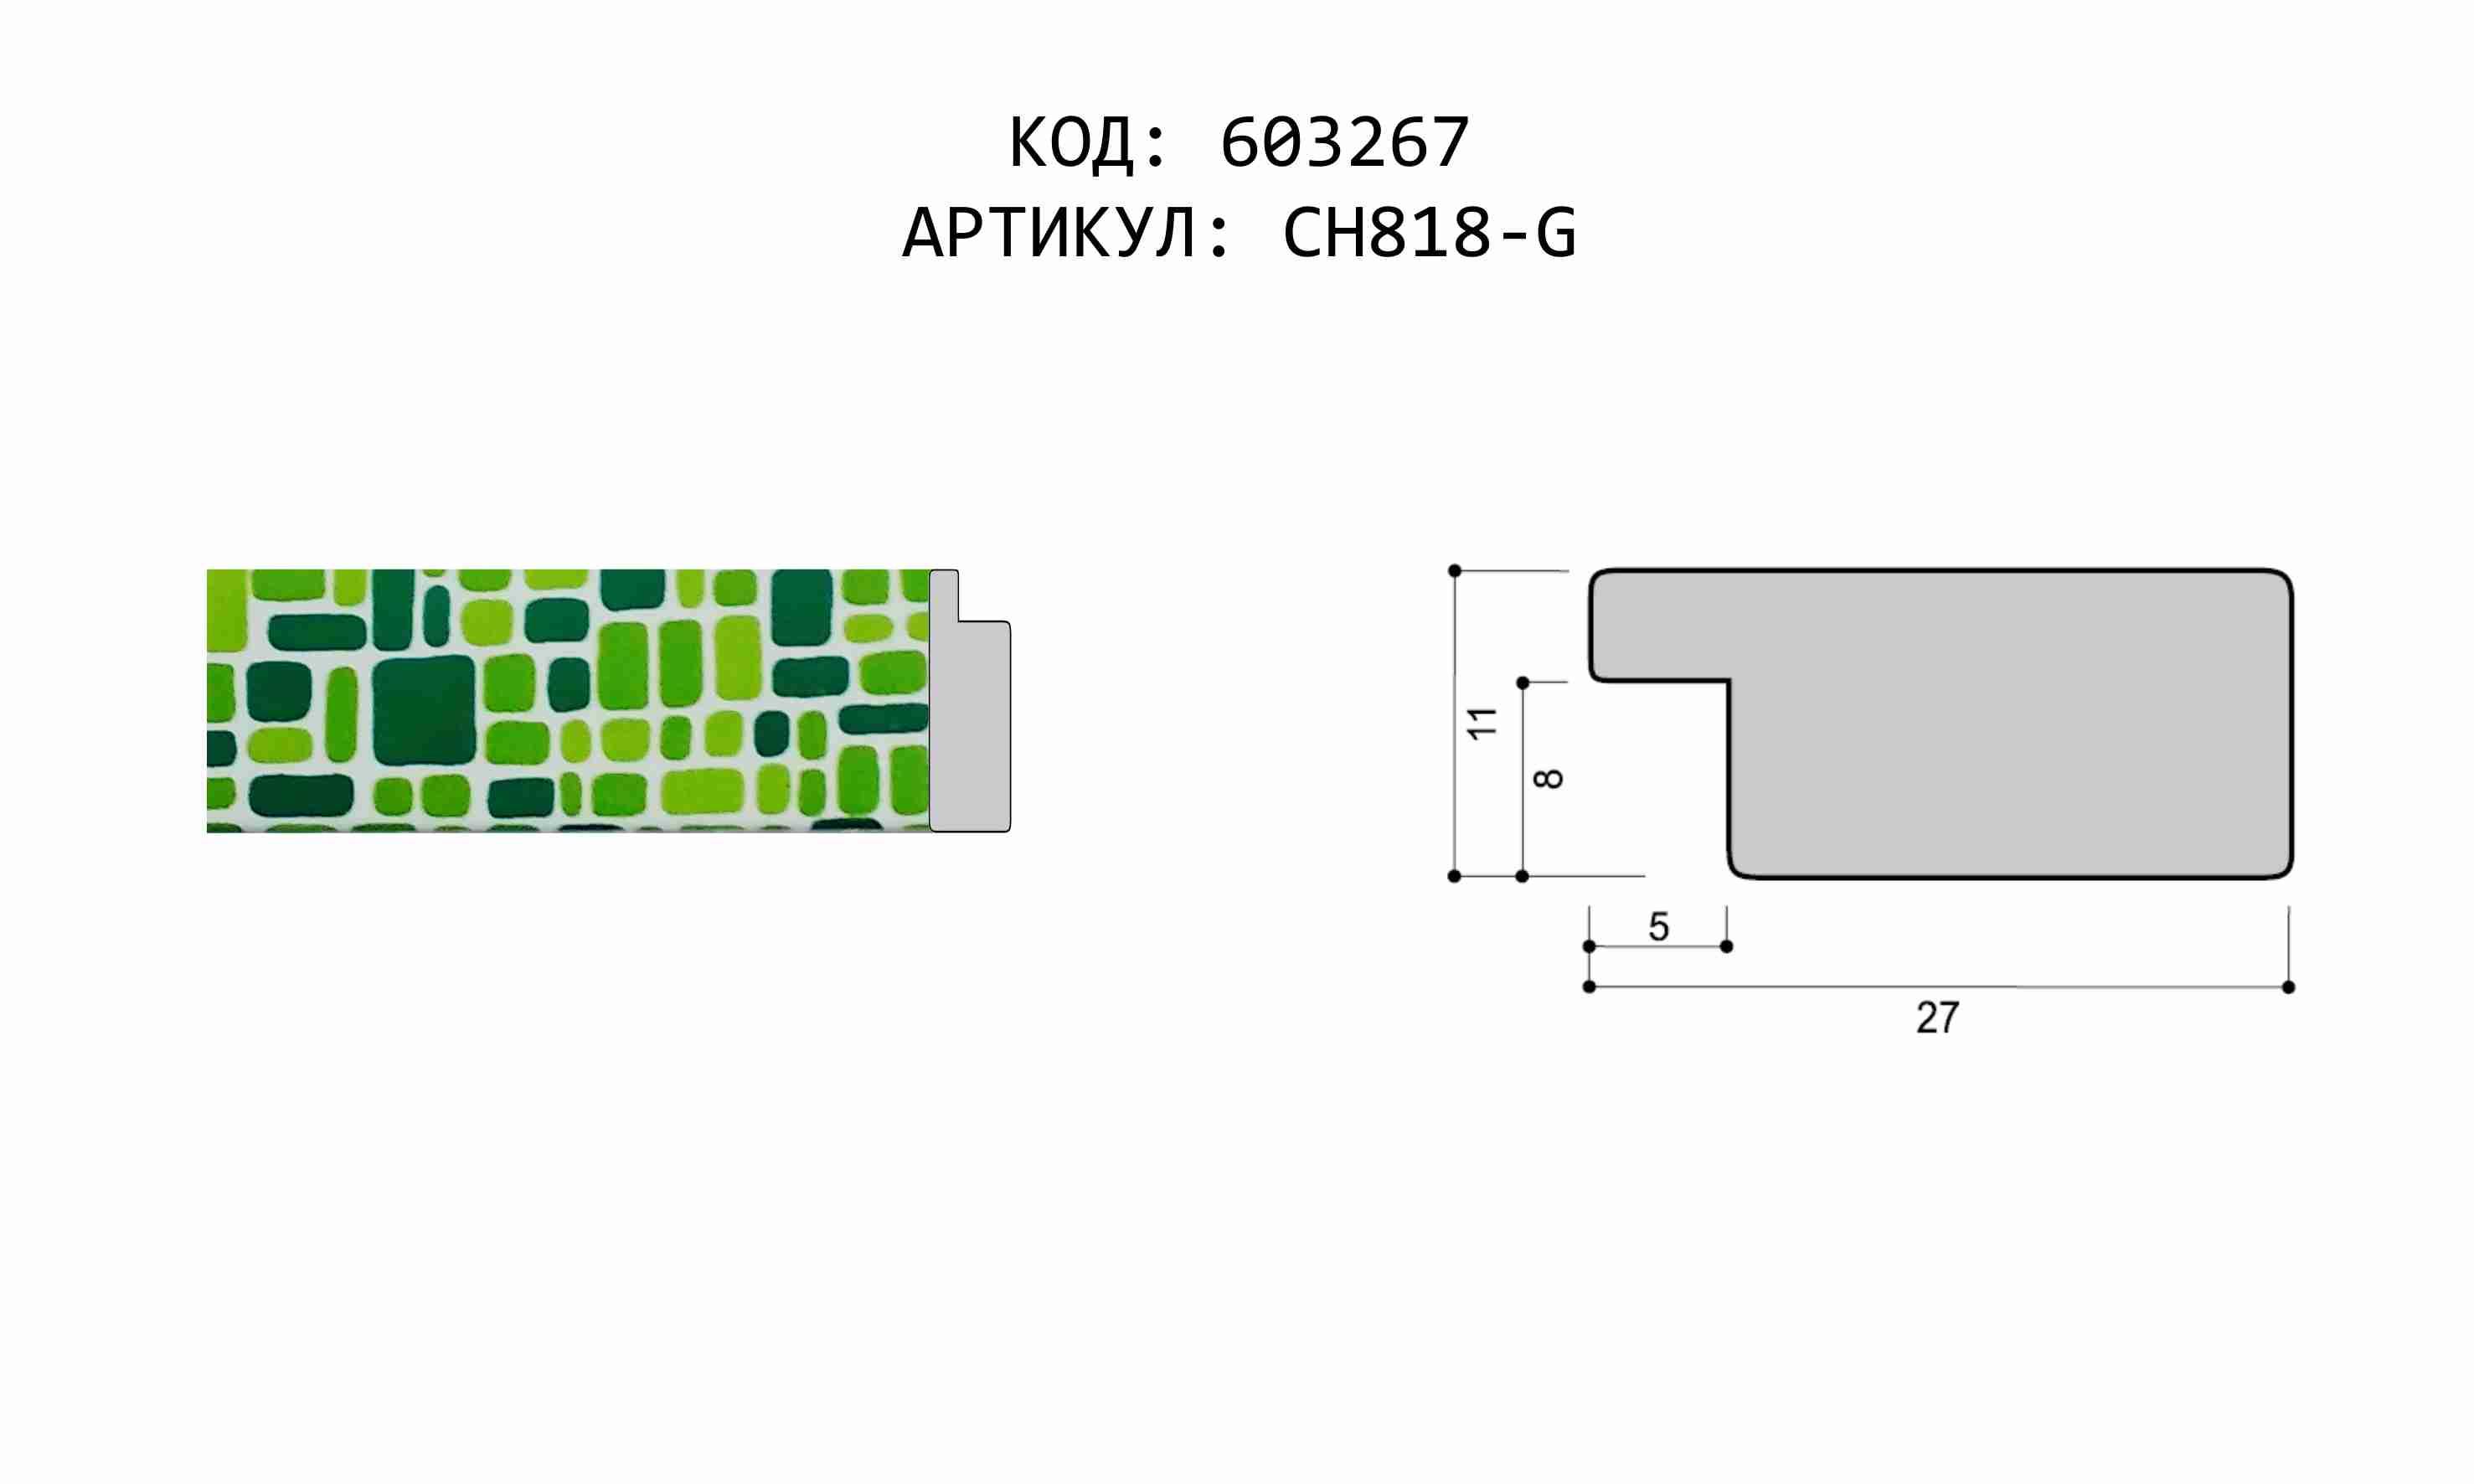 Артикул: CH818-G